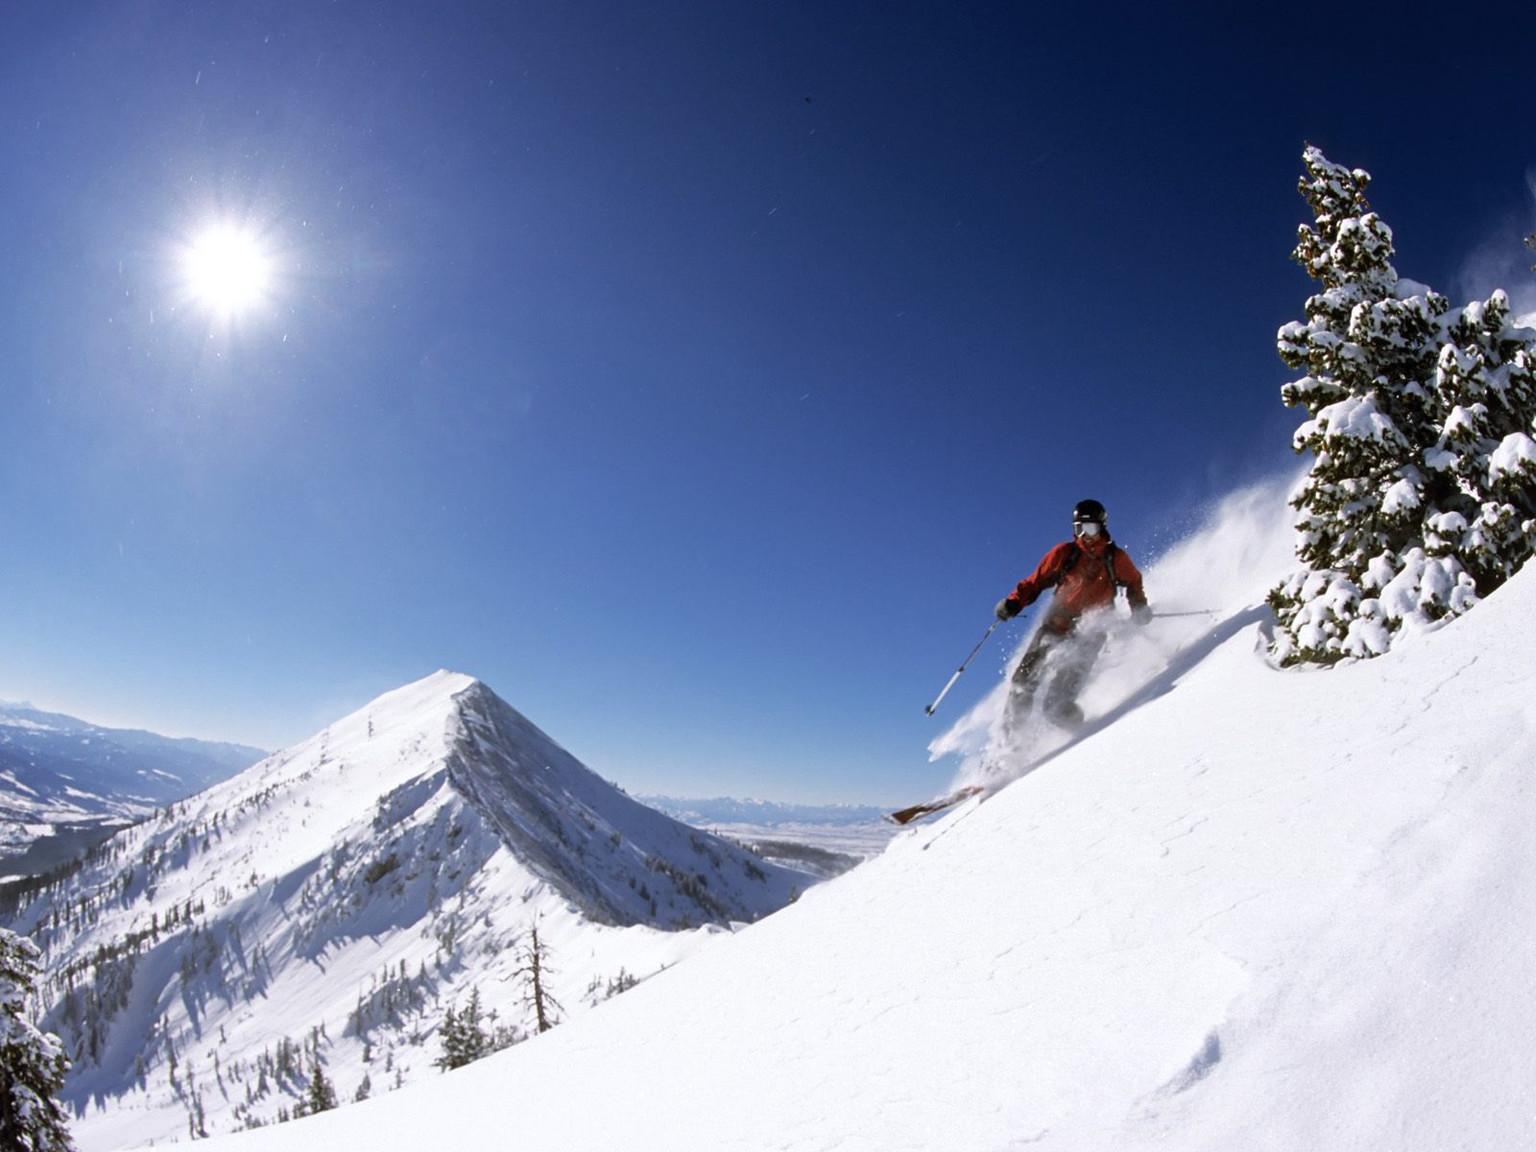 ws_Telemark_Skiing_1600x1200.jpg